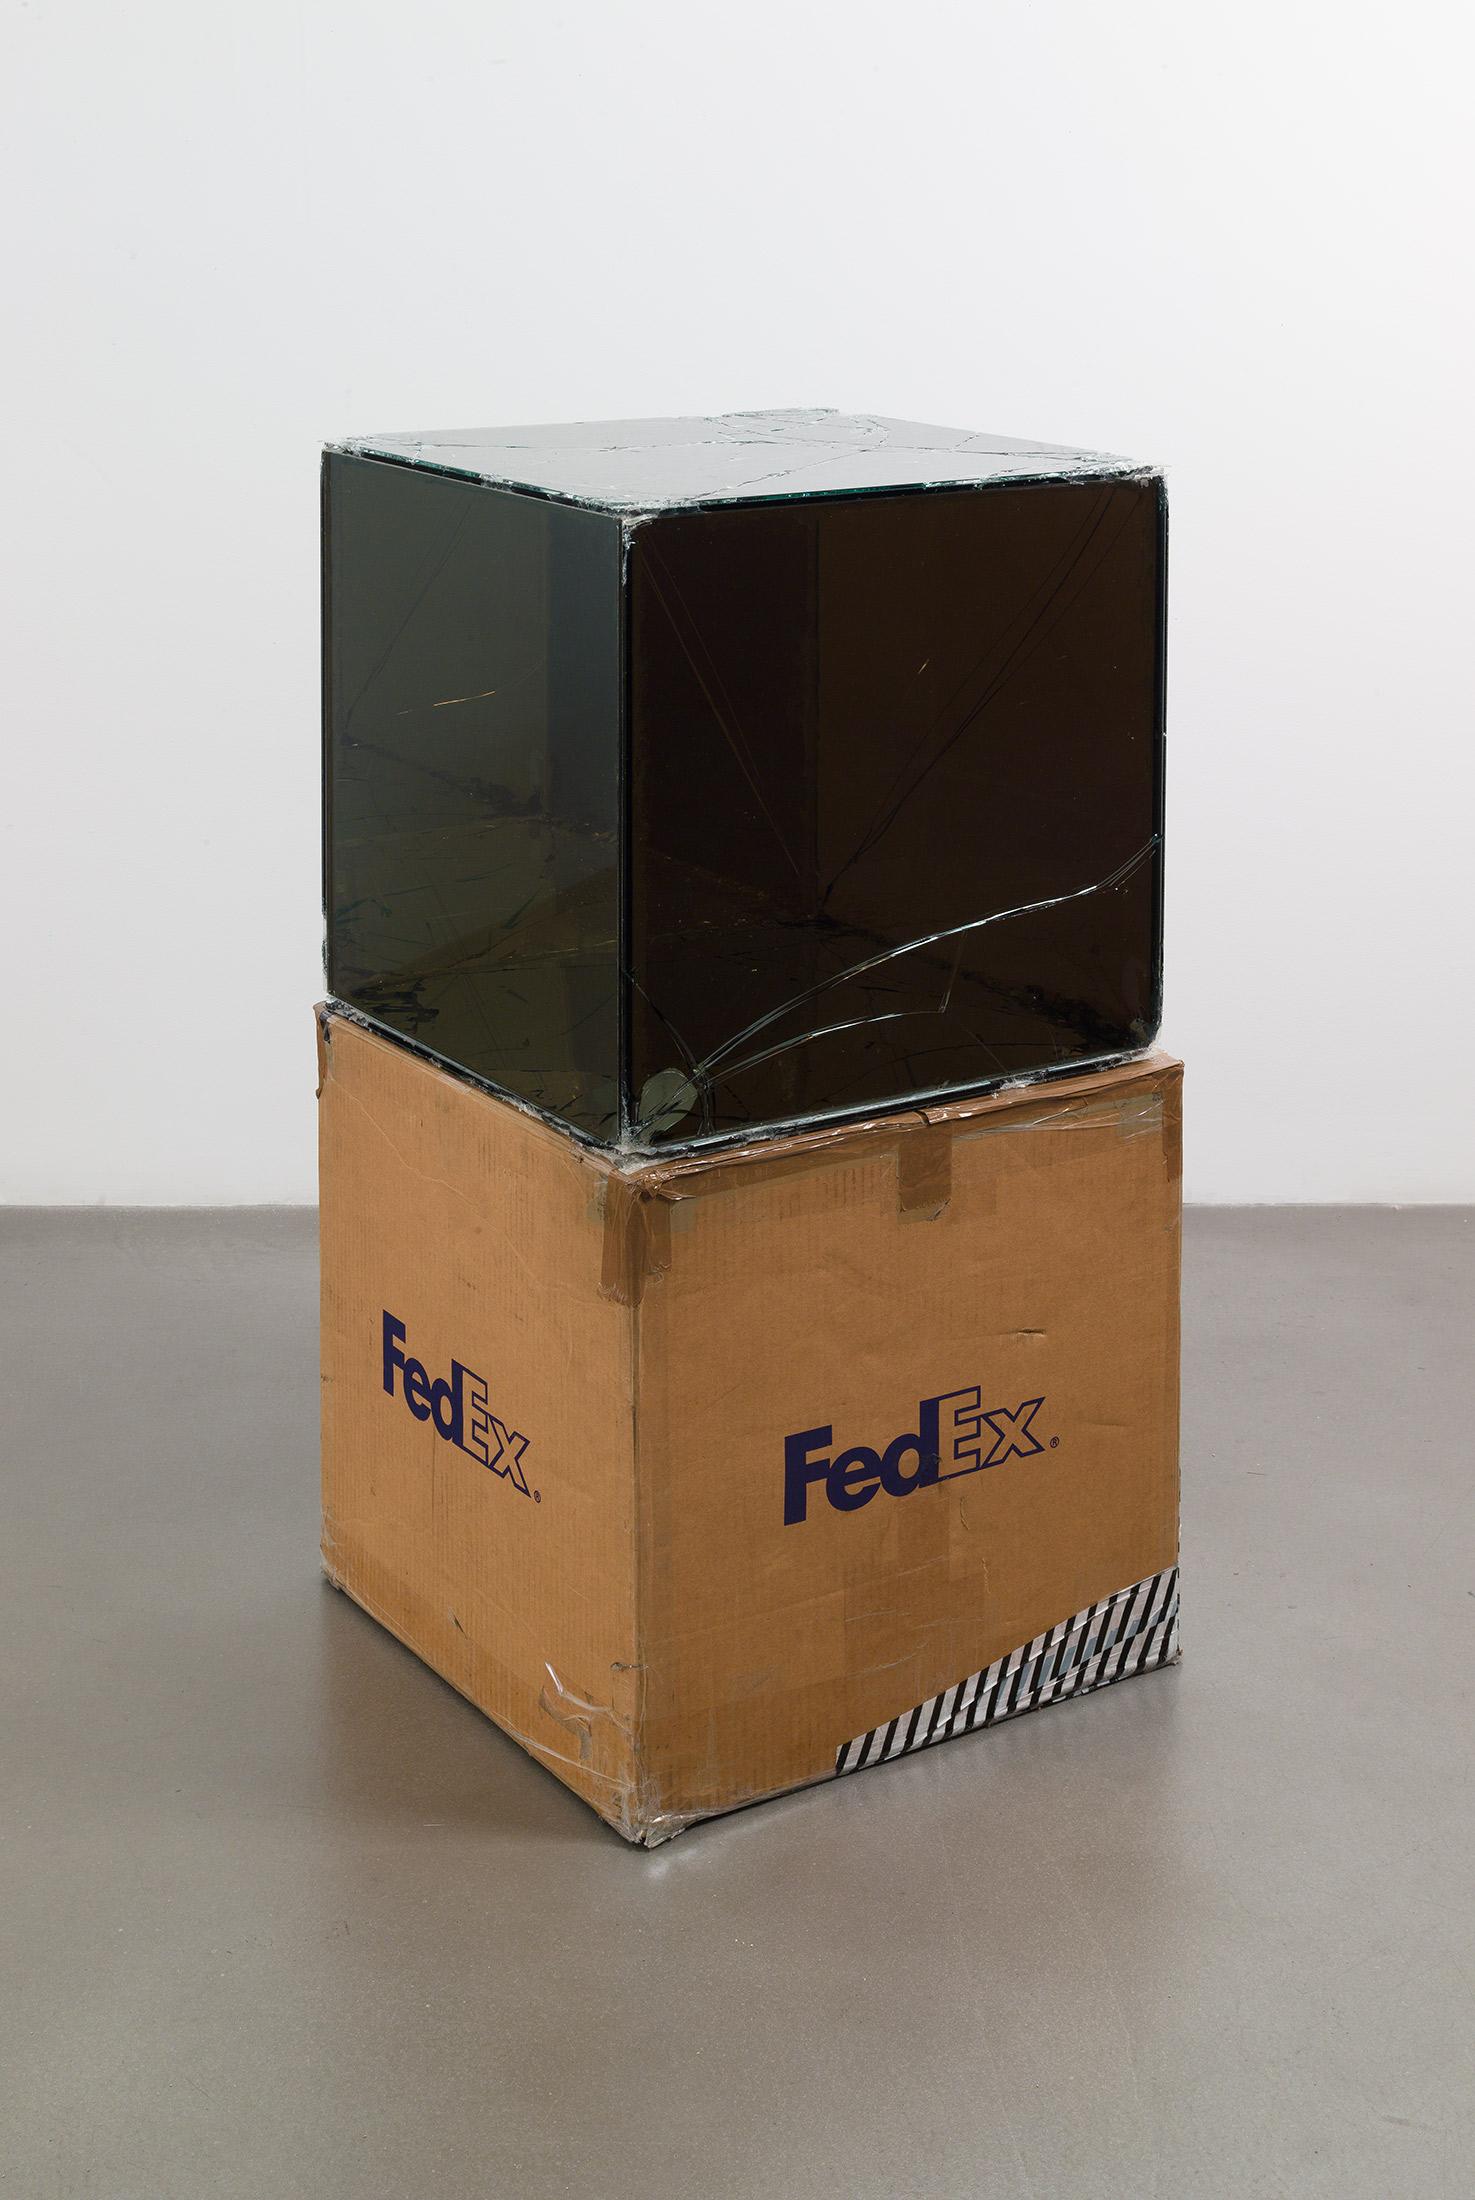 FedEx® Large Kraft Box  © 2005 FEDEX 330508 REV 10/05 SSCC, Standard Overnight, Los Angeles–Oak Park trk#865344981196, September 17–18, 2008, Standard Overnight, Oak Park–Los Angeles trk#865326699753, March 12–13, 2009, Standard Overnight, Los Angeles–New York trk#774901624186, November 4–5, 2015, Standard Overnight, New York–Los Angeles trk#775241295627, December 21–22, 2015    2008–   Laminated Mirropane, FedEx shipping box, accrued FedEx shipping and tracking labels, silicone, metal, tape  20 x 20 x 20 inches   FedEx Glass Works, 2007–